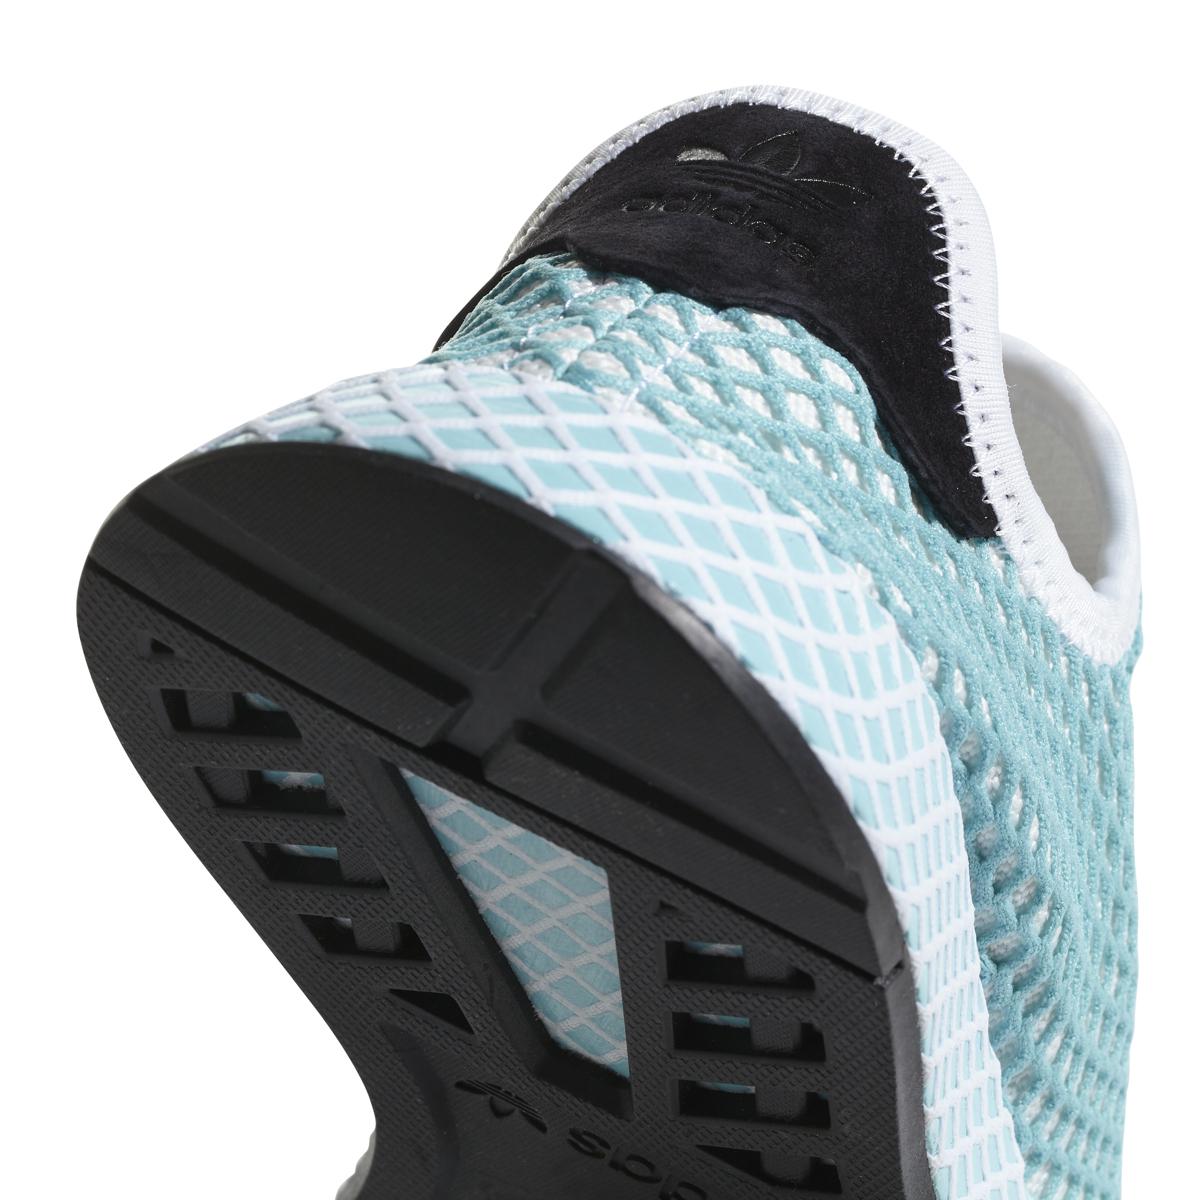 bc27446d3 Adidas Women s Deerupt Runner Parley in White Blue Spirit — MAJOR